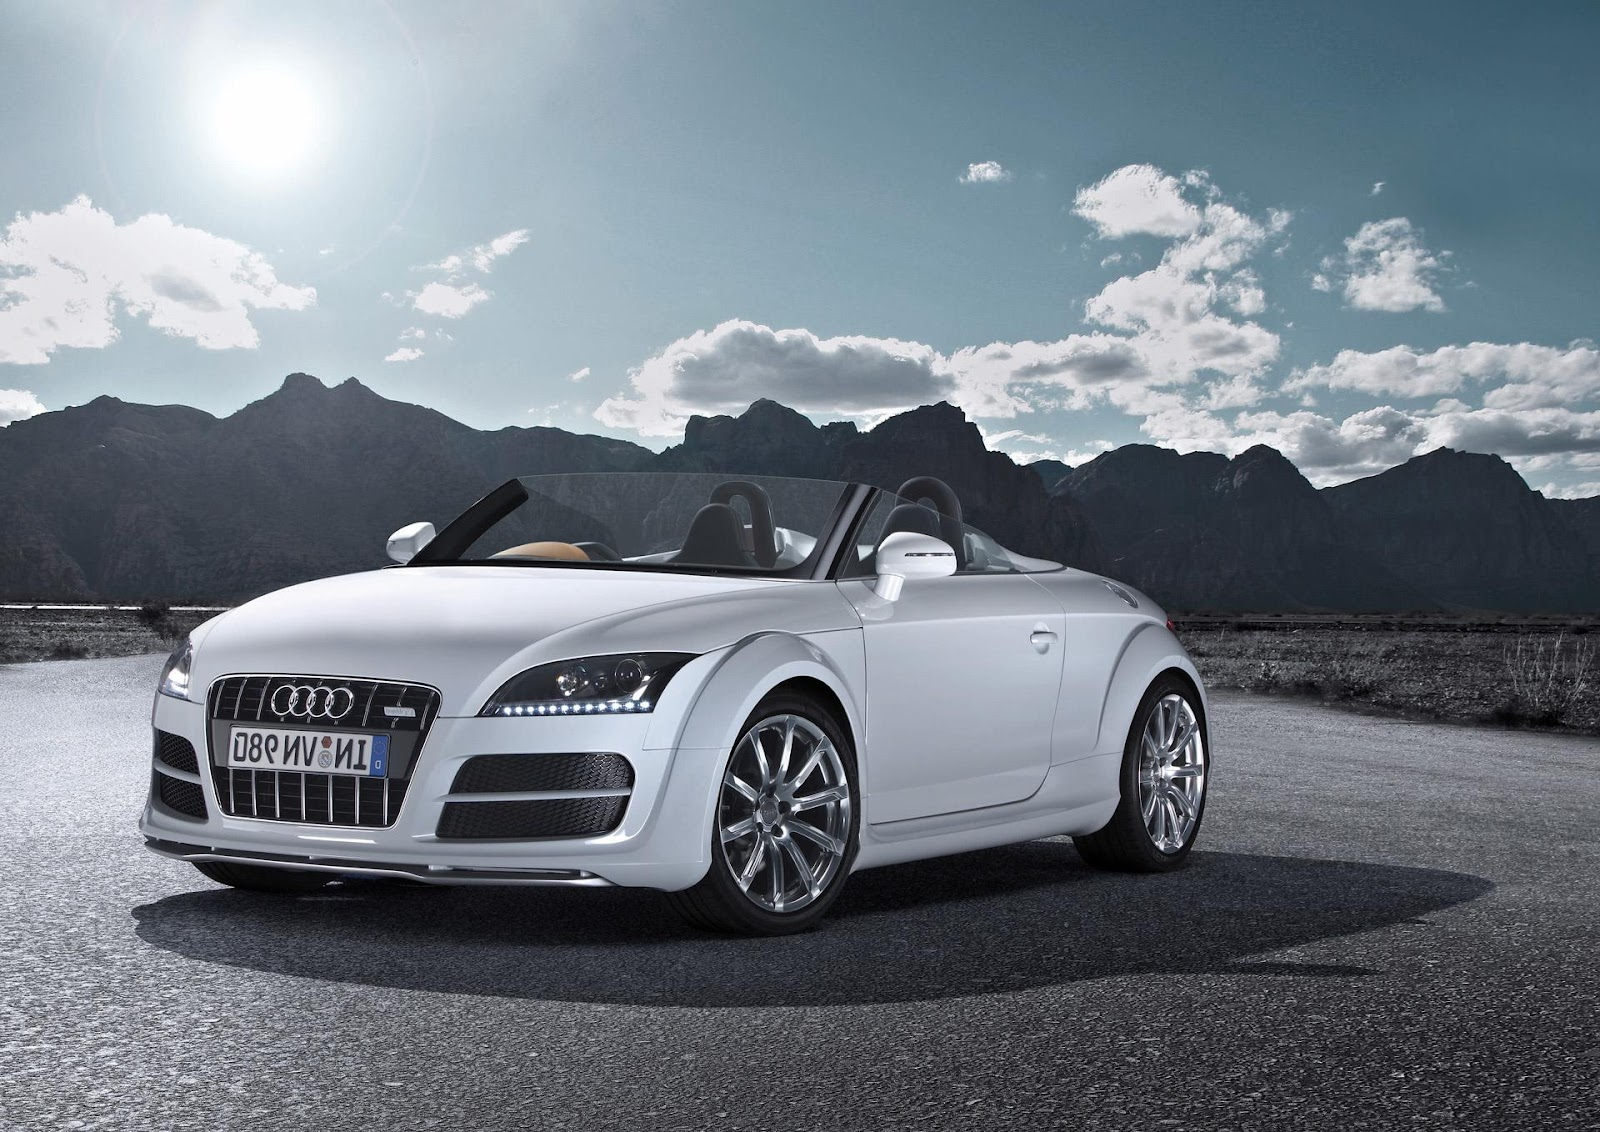 Audi Tt White Convertible